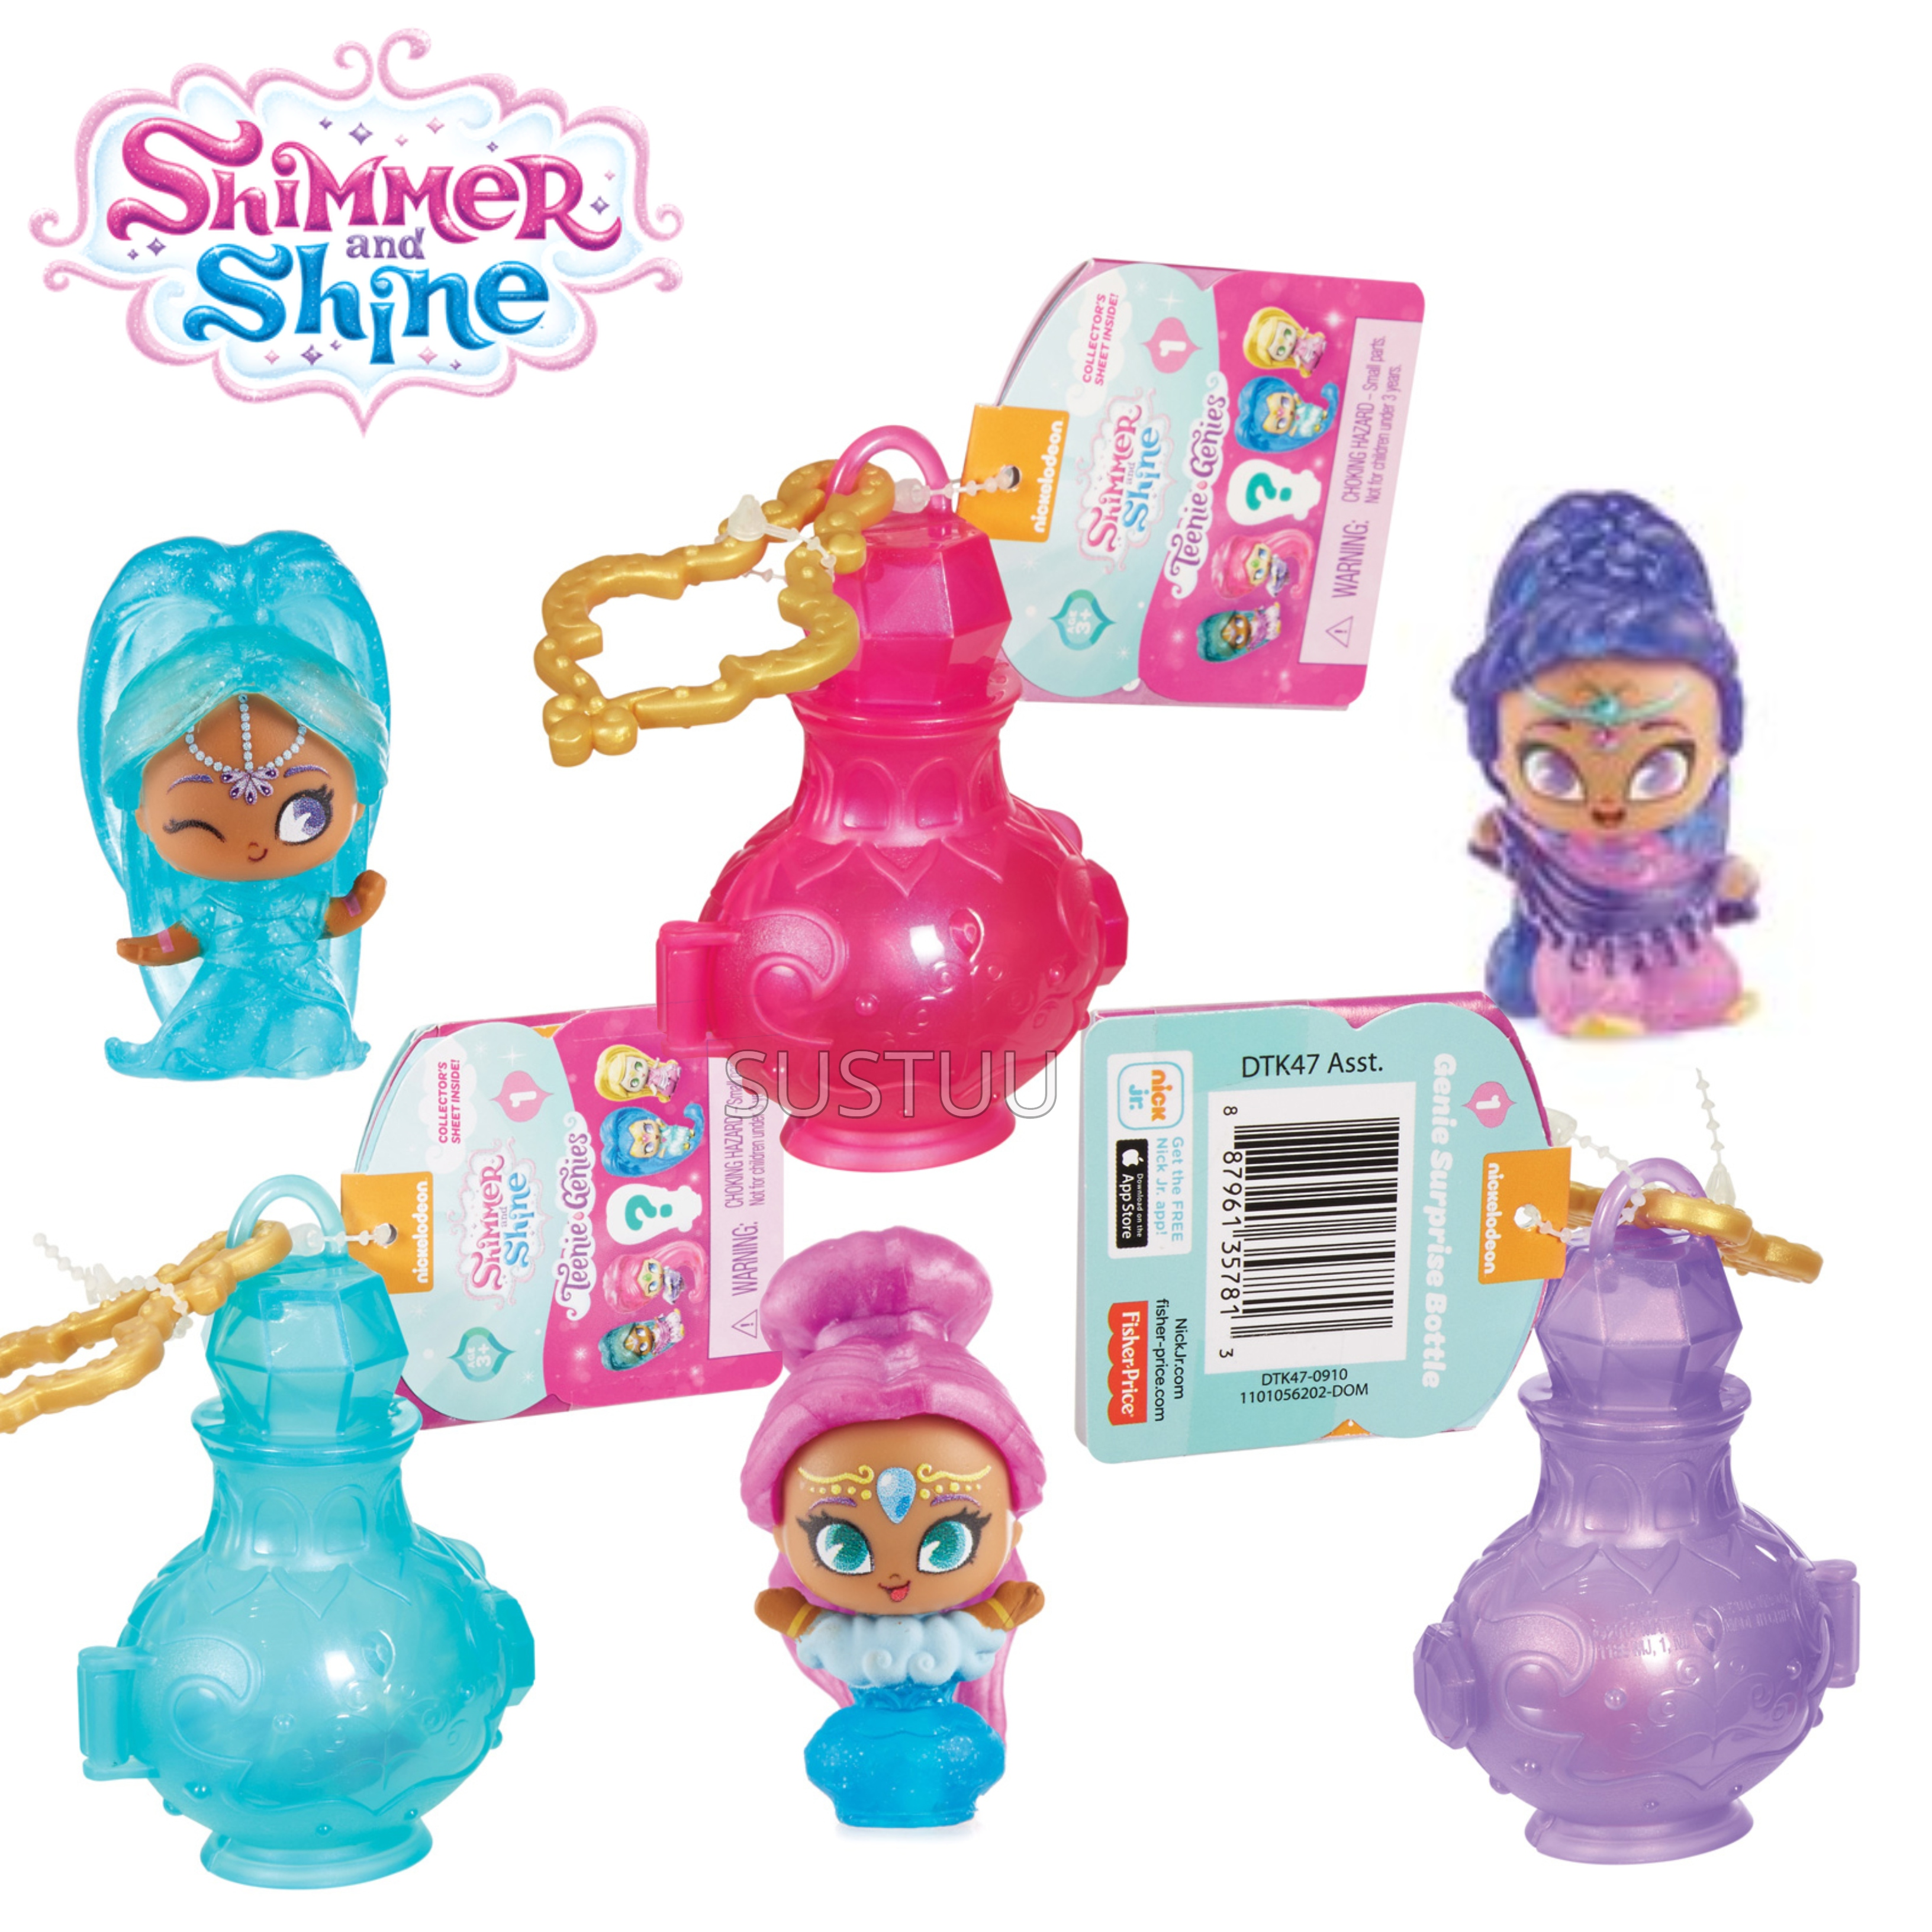 Shimmer and Shine Teenie Genie Bottle Surprise | Kid/ Baby's Fun Activity Playset | Giftware | +3 Years